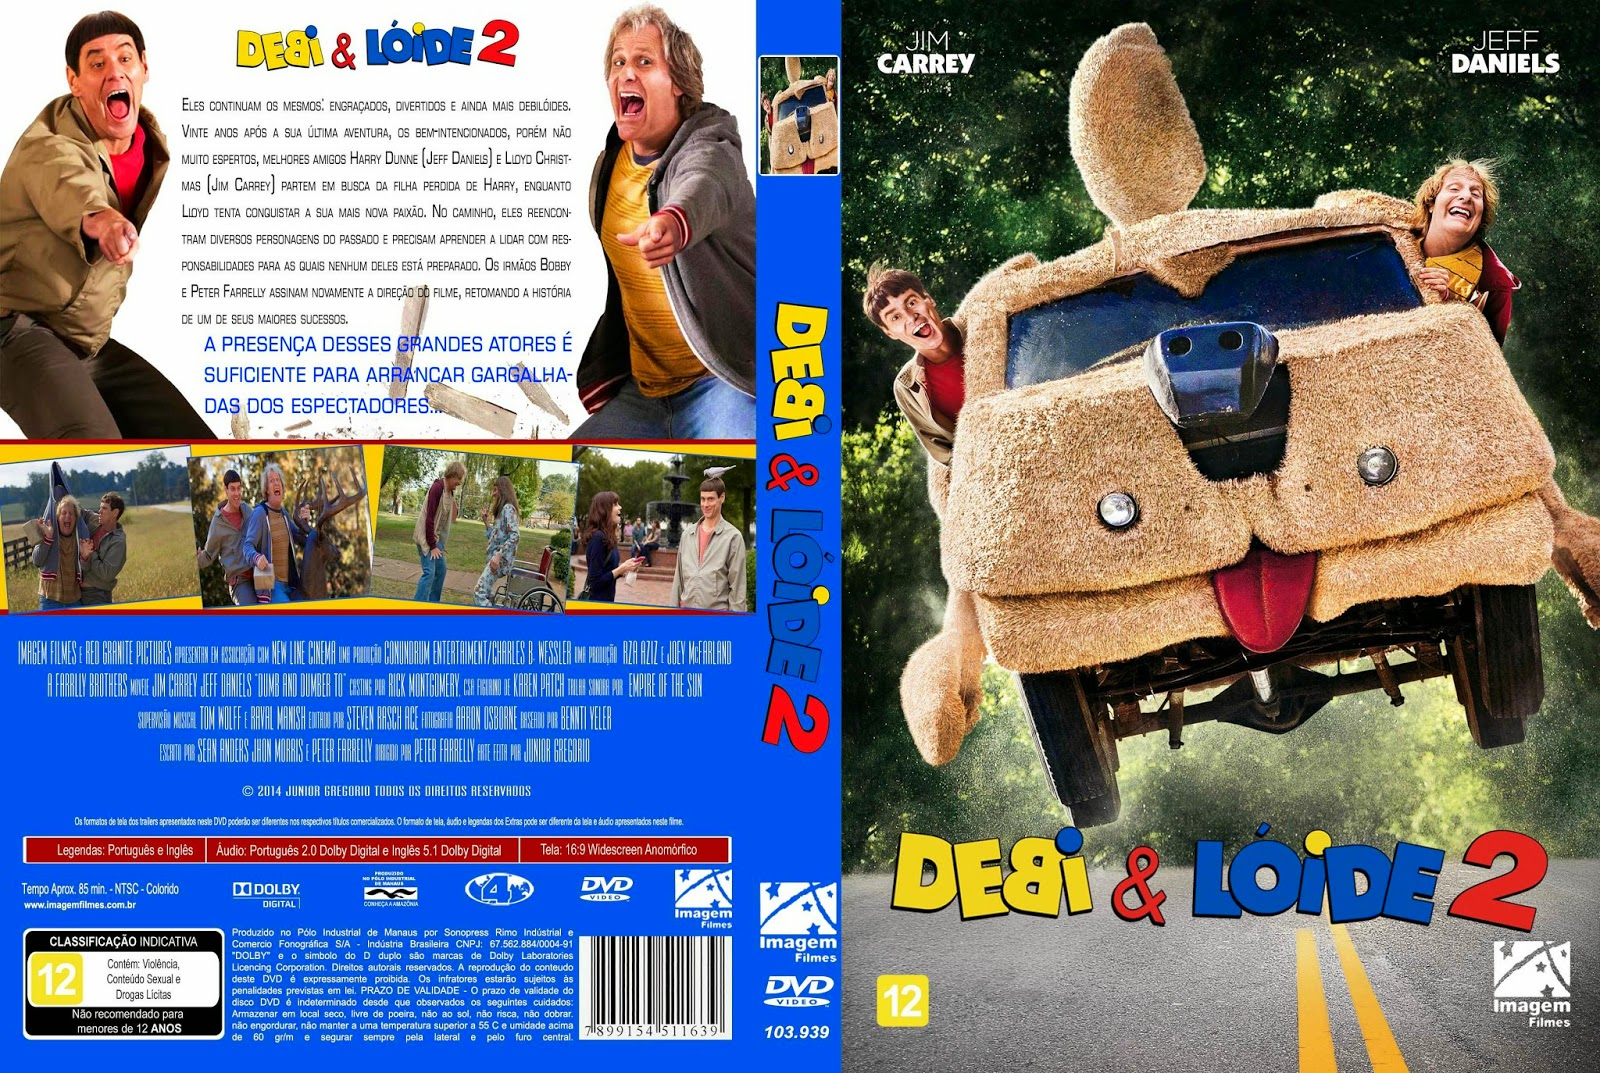 Baixar Debi & Lóide 2 DVD-R AUTORADO OF5pvLD